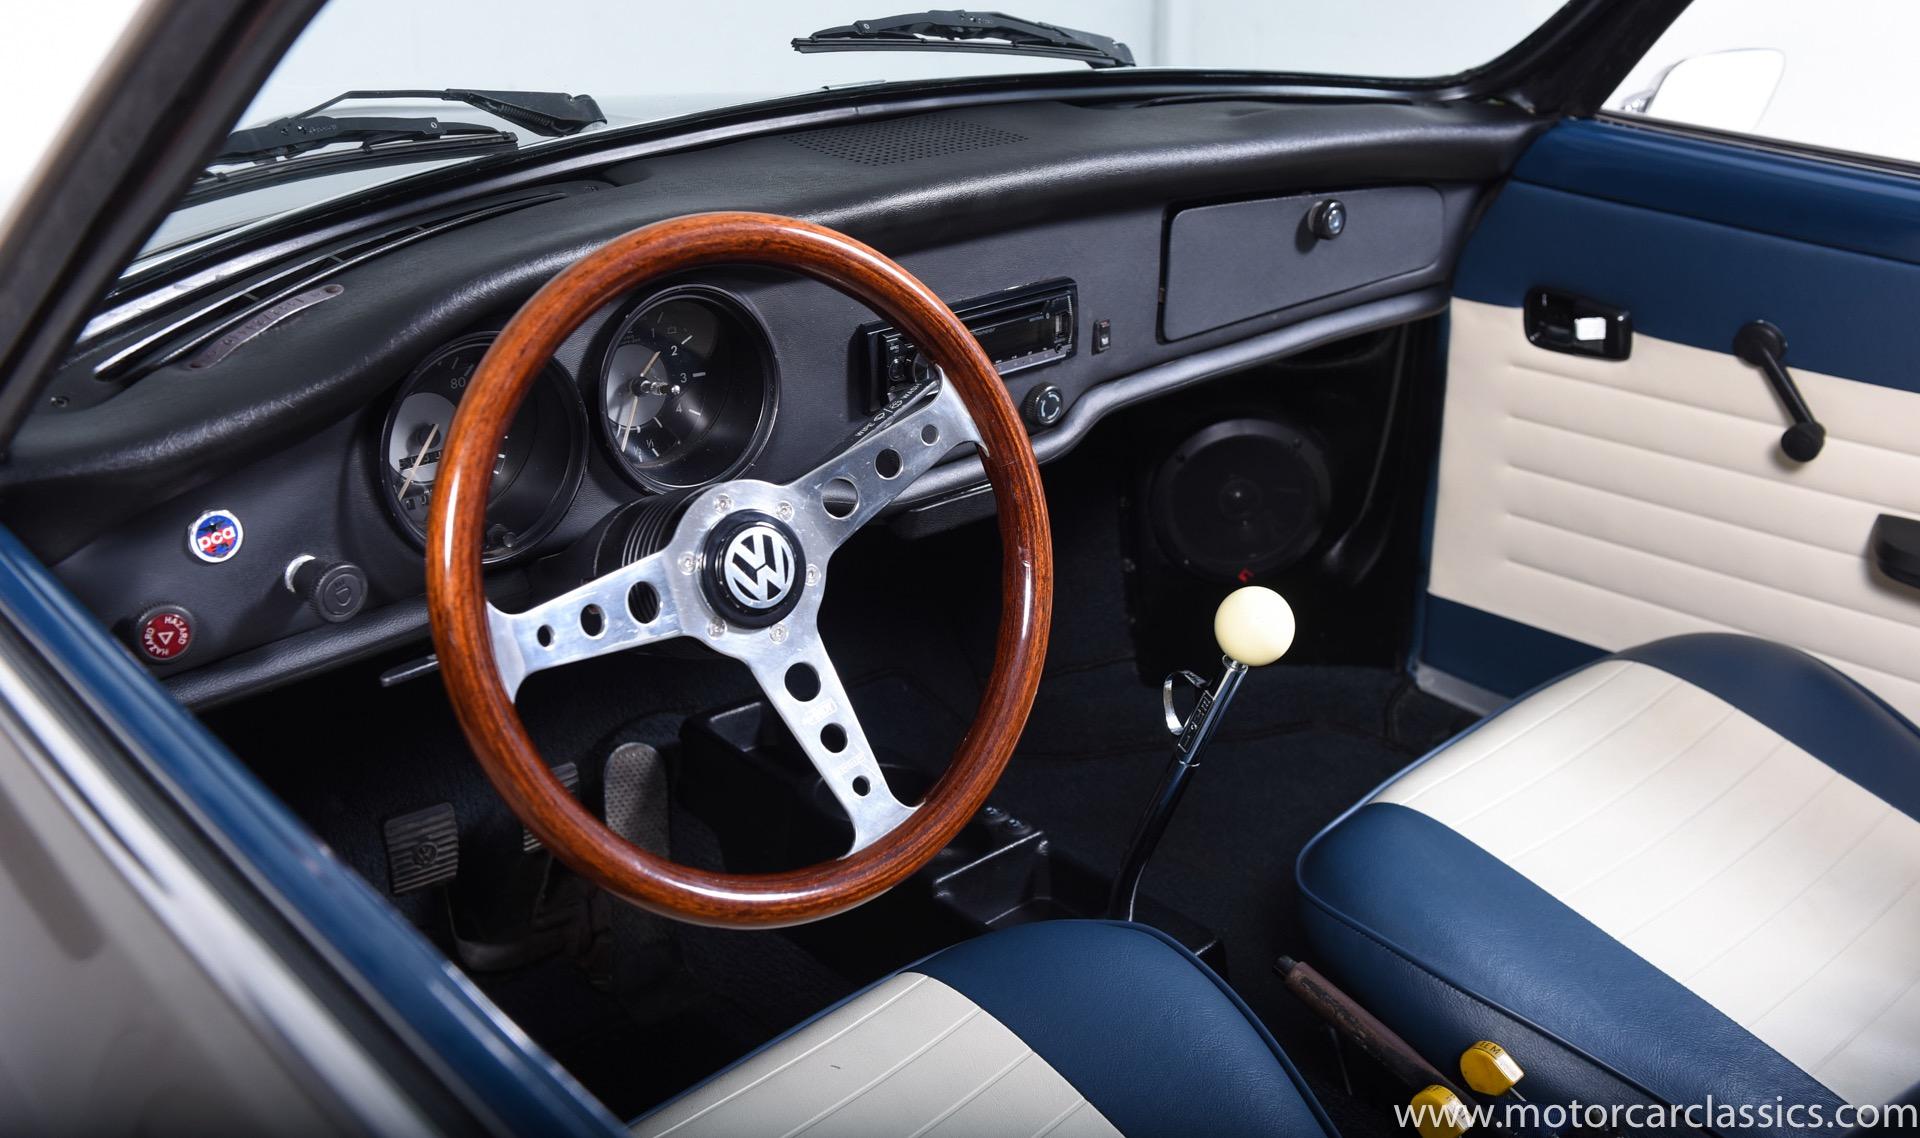 1974 Volkswagen Karmann Ghia